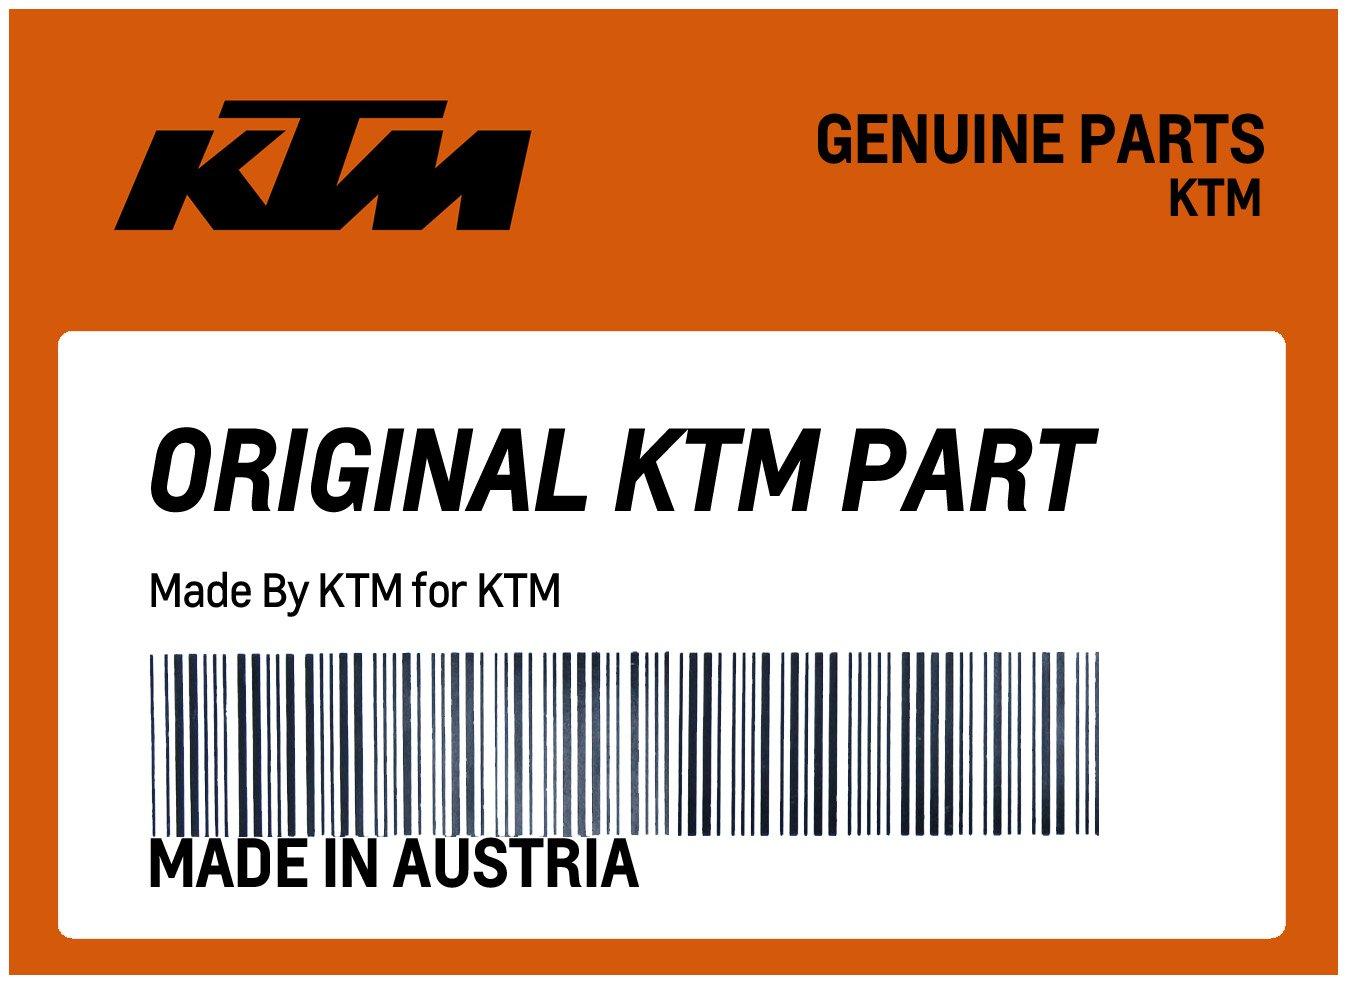 KTM 902060083 AH OVAL SCREW ISO 7380 M